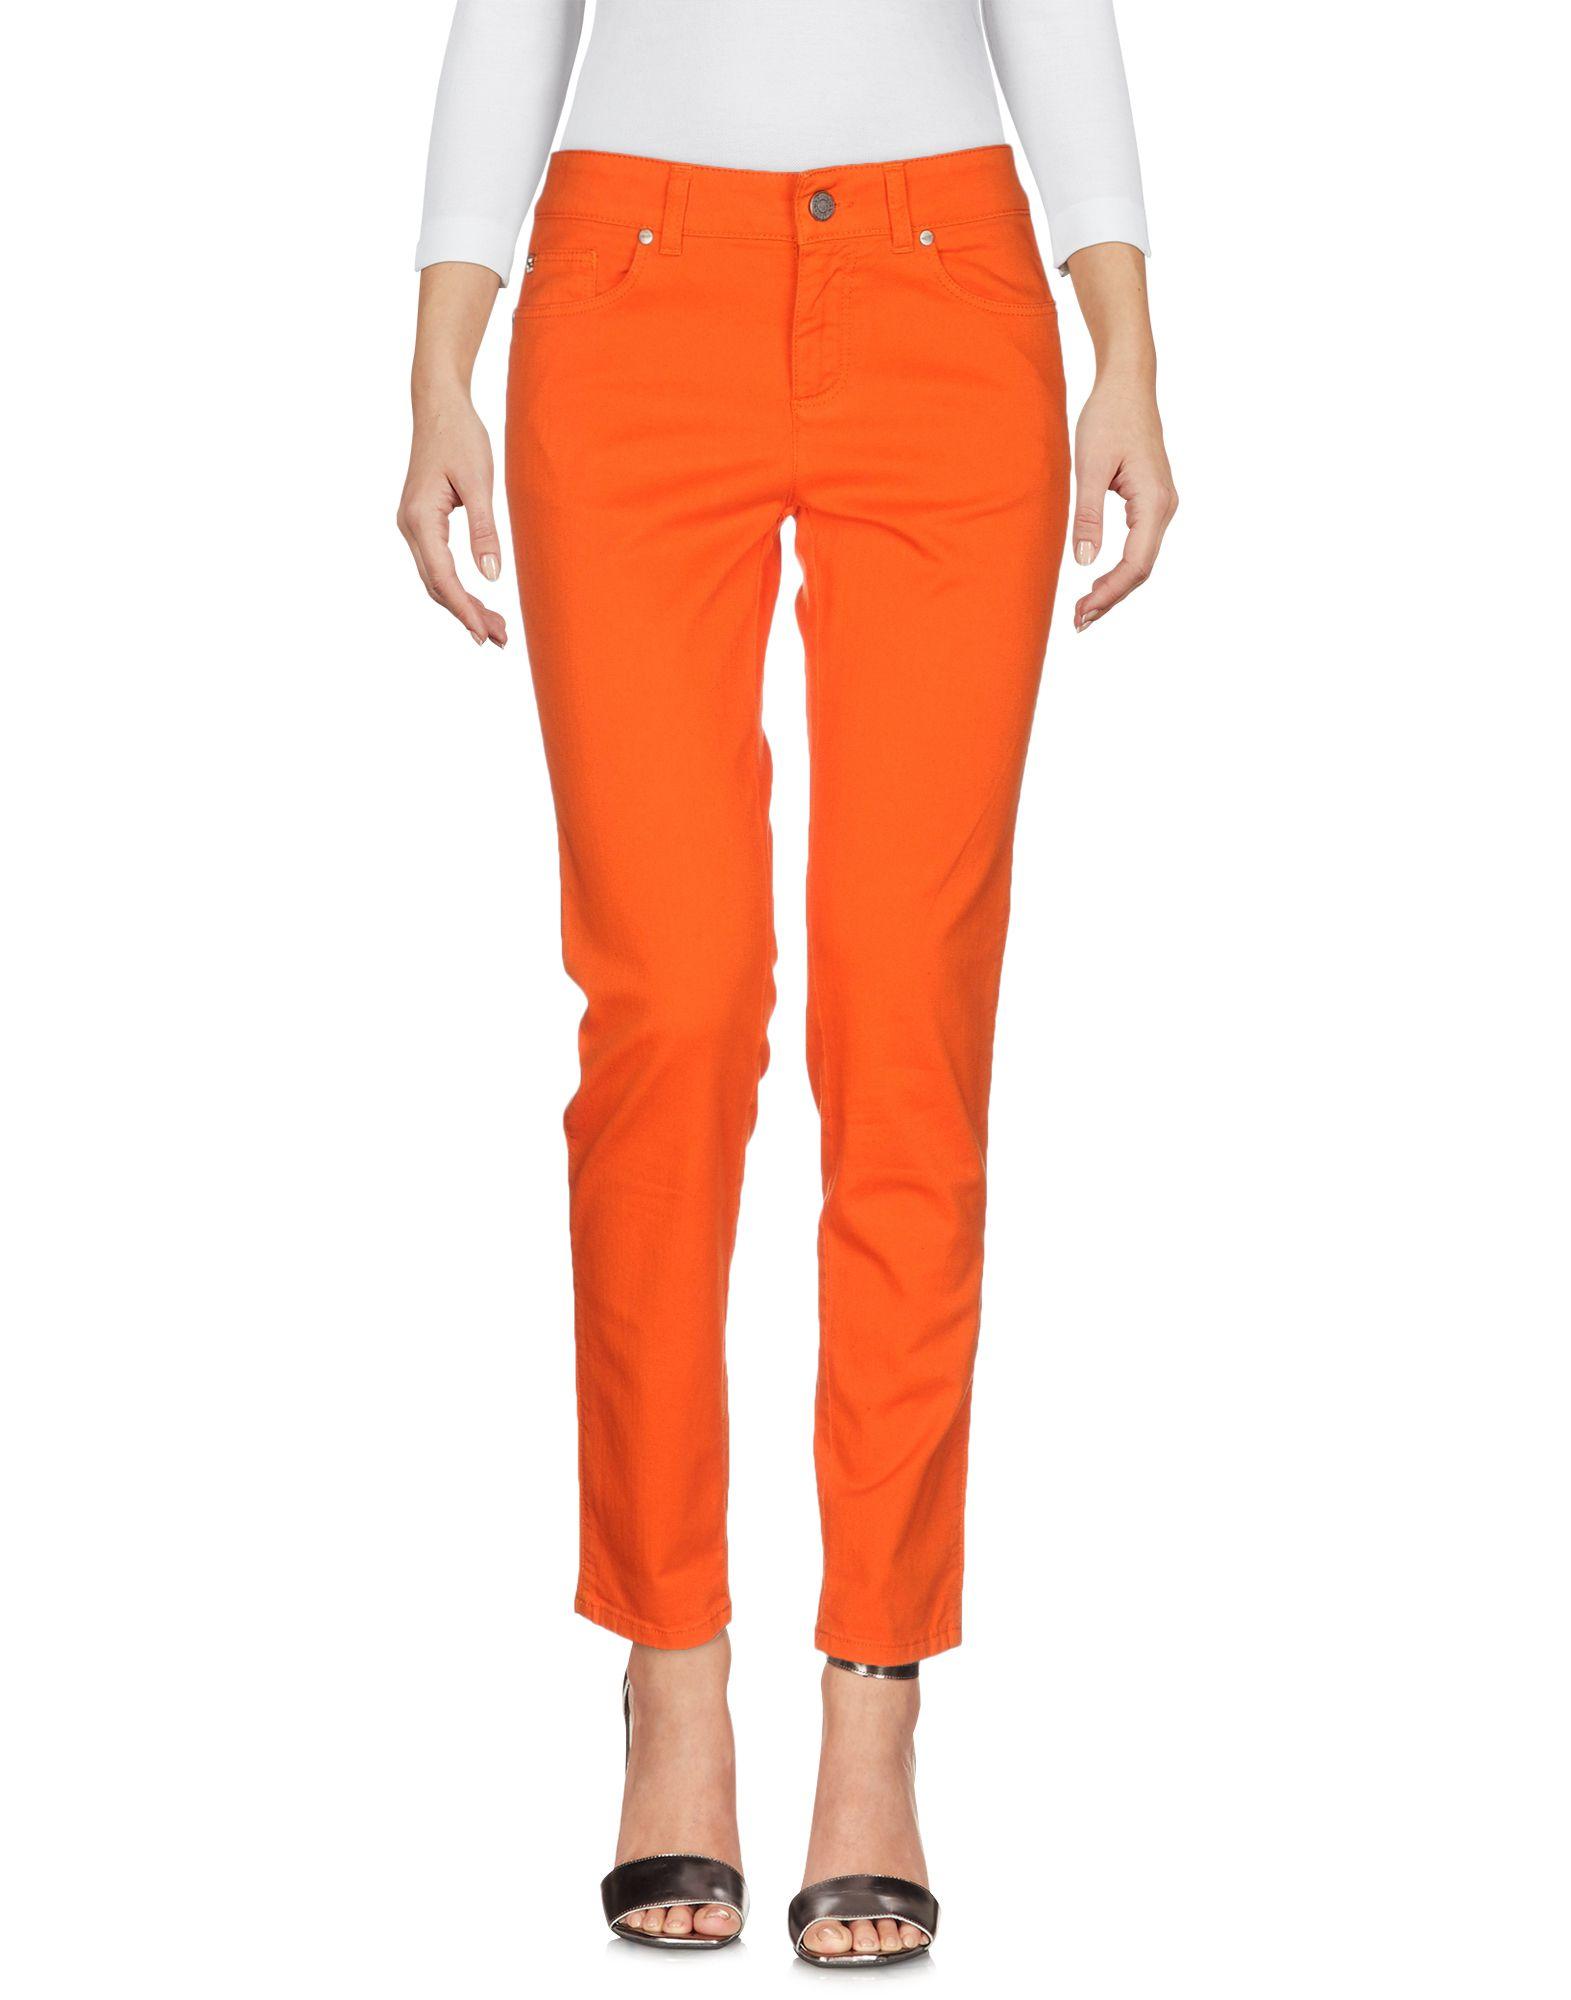 Pantaloni Jeans Alexander Mcqueen Donna - Acquista online su mebjY